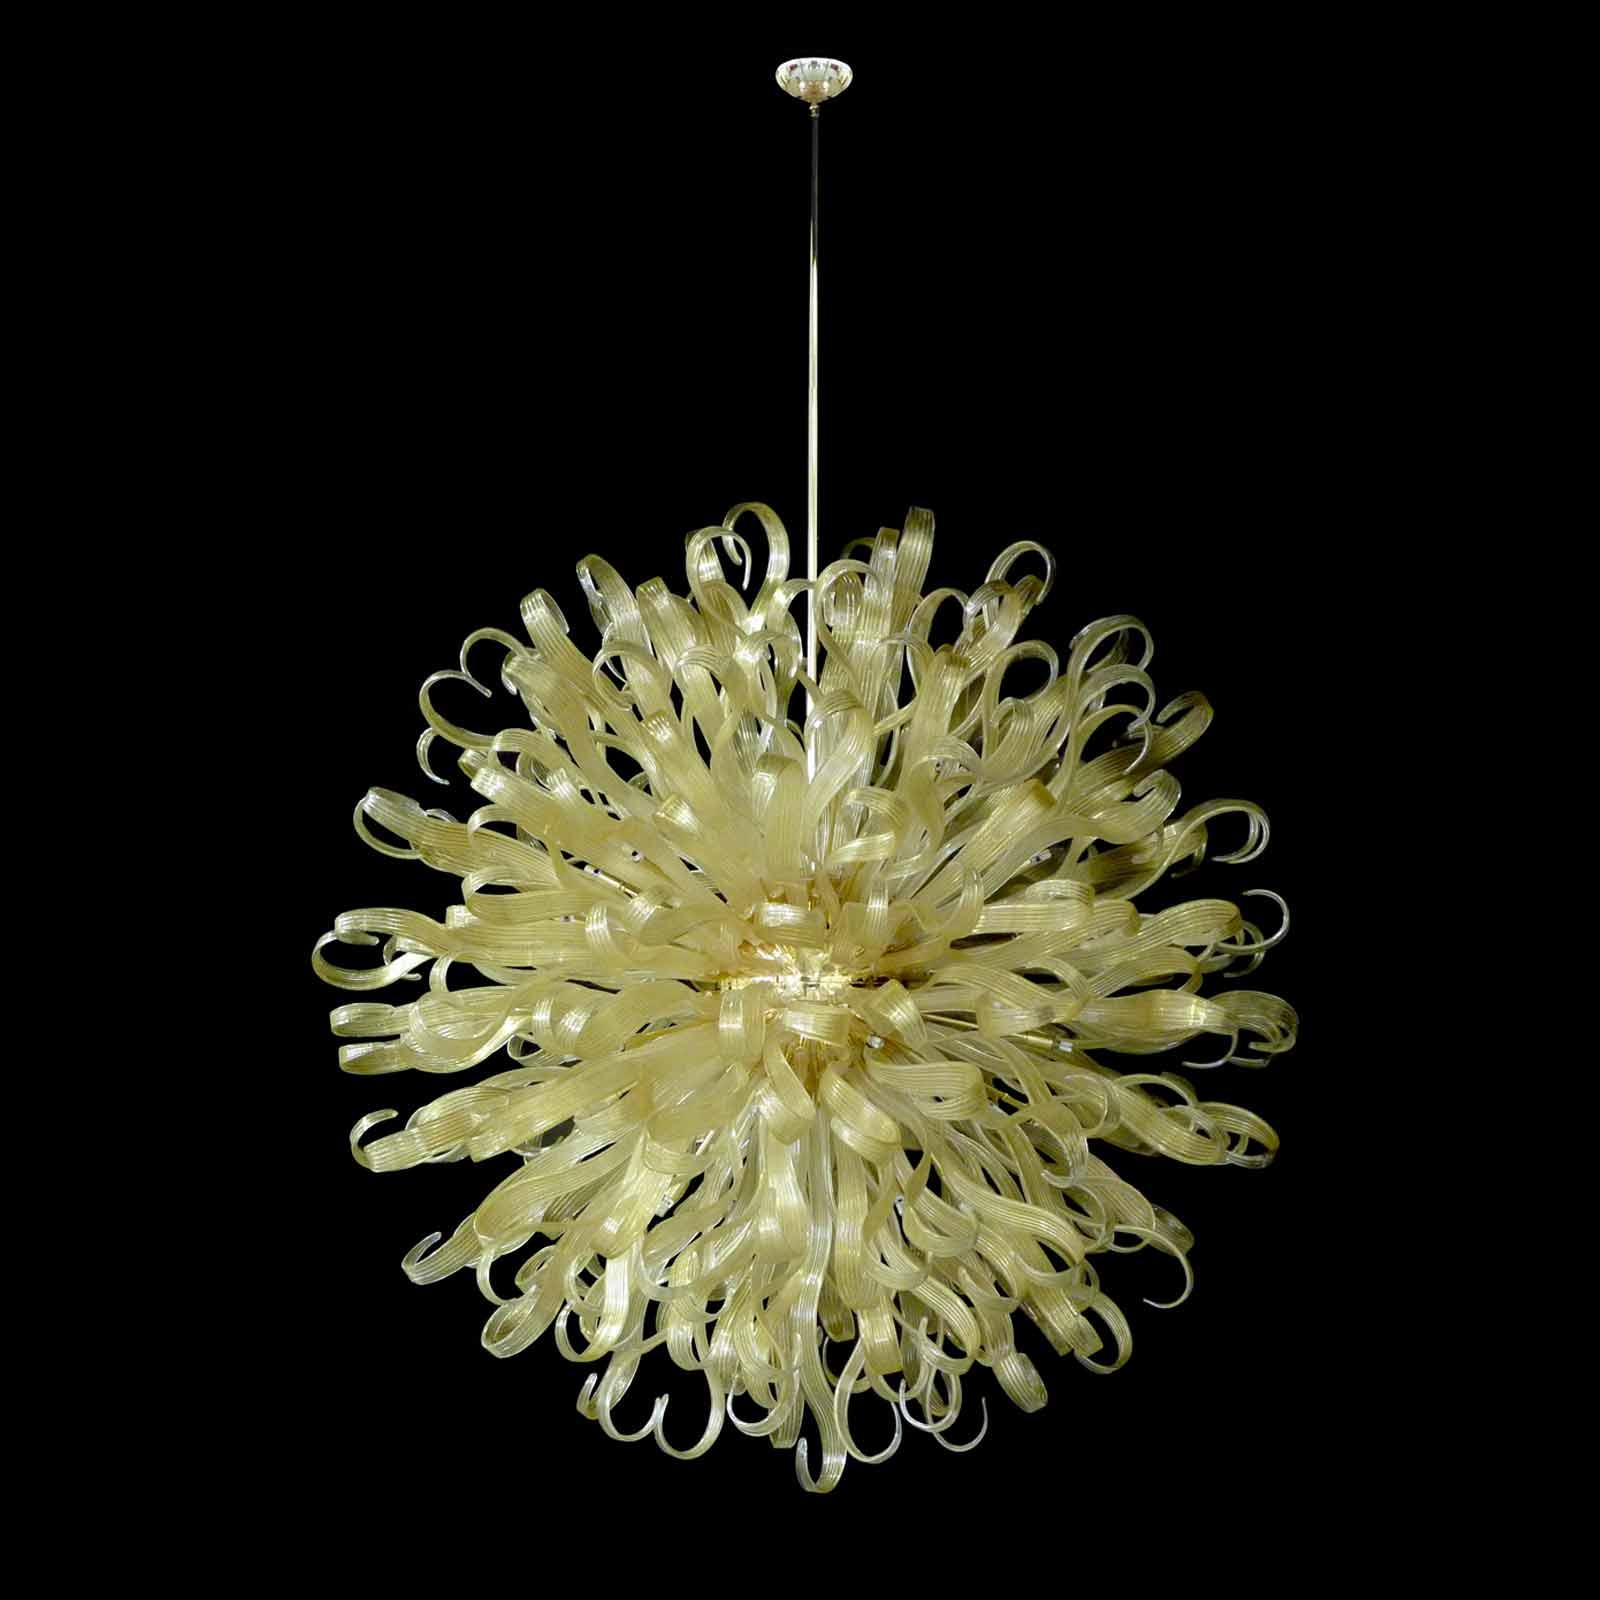 Ducale modern chandelier Murano blown glass   Lucevetro